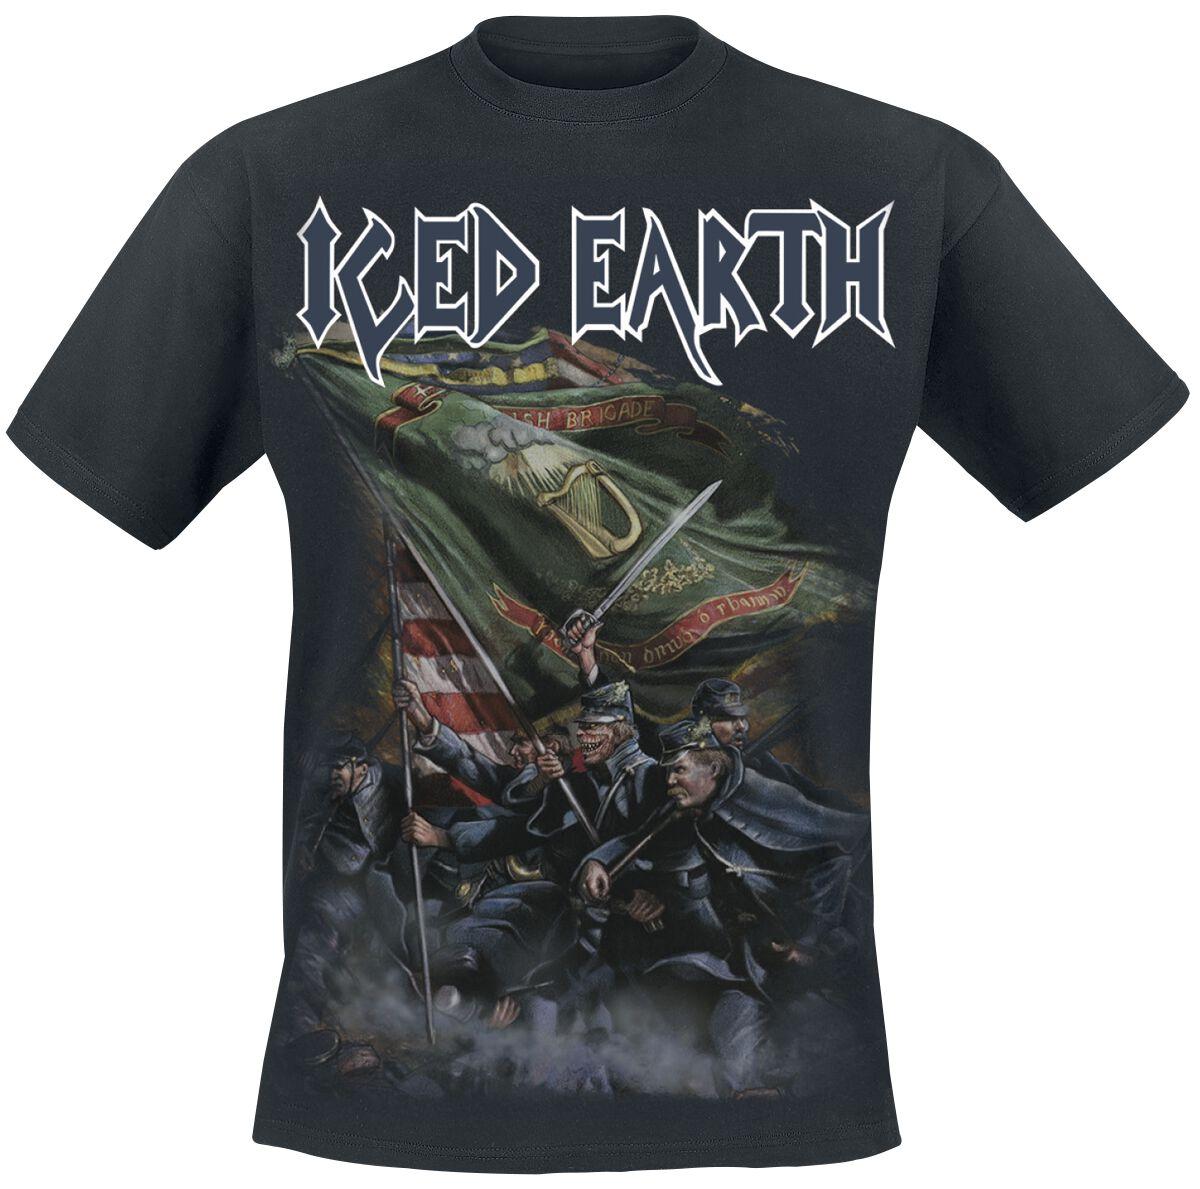 Zespoły - Koszulki - T-Shirt Iced Earth Clear the way T-Shirt czarny - 373528